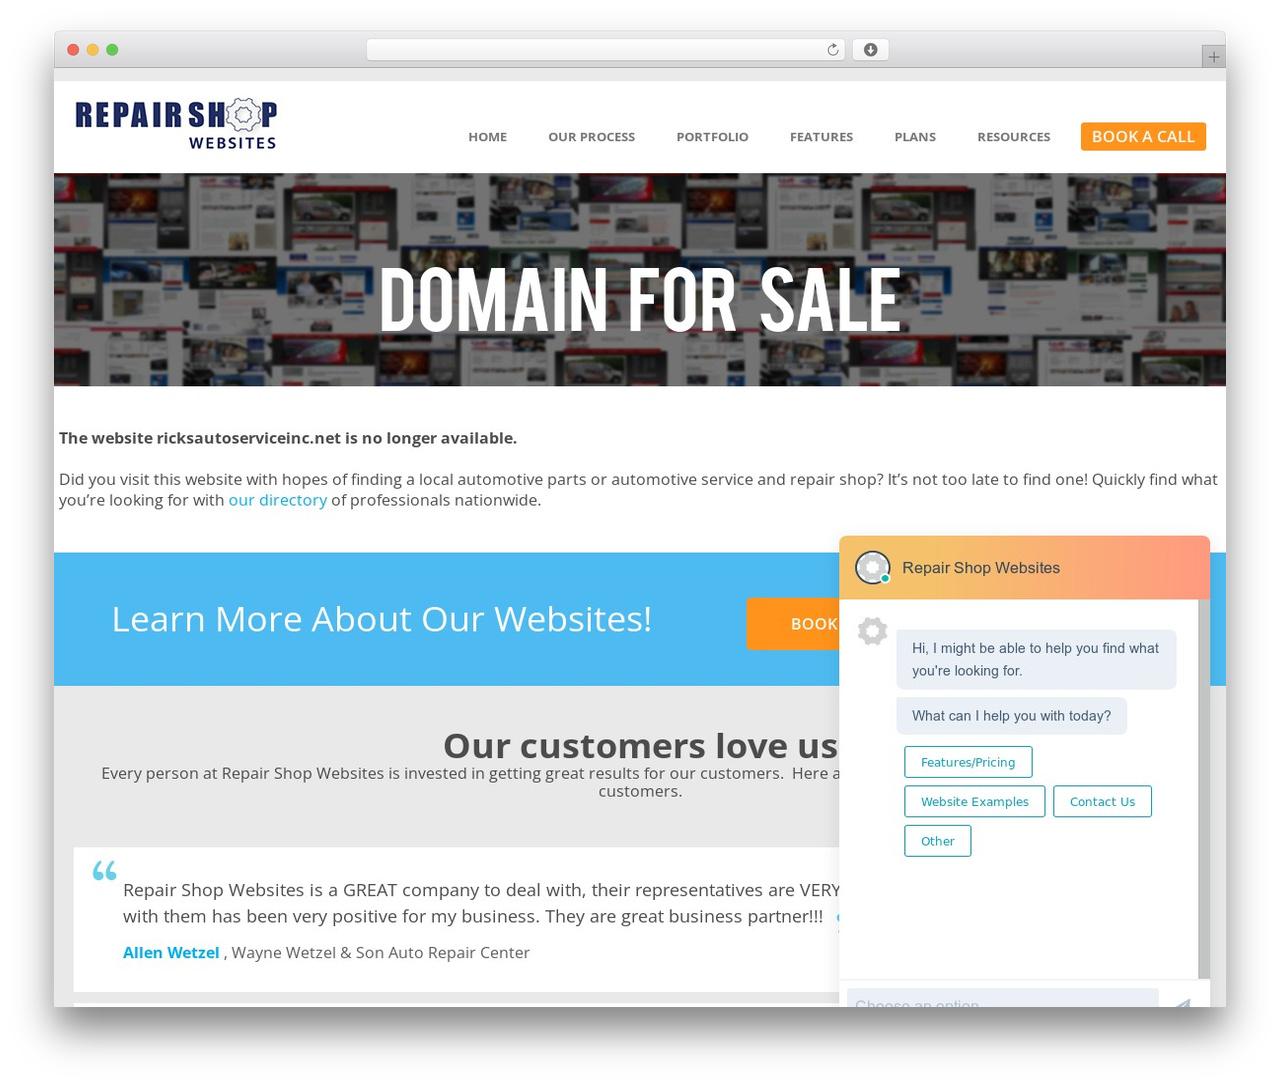 WordPress template RSW by Sachin Khosla - repairshopwebsites.com ...